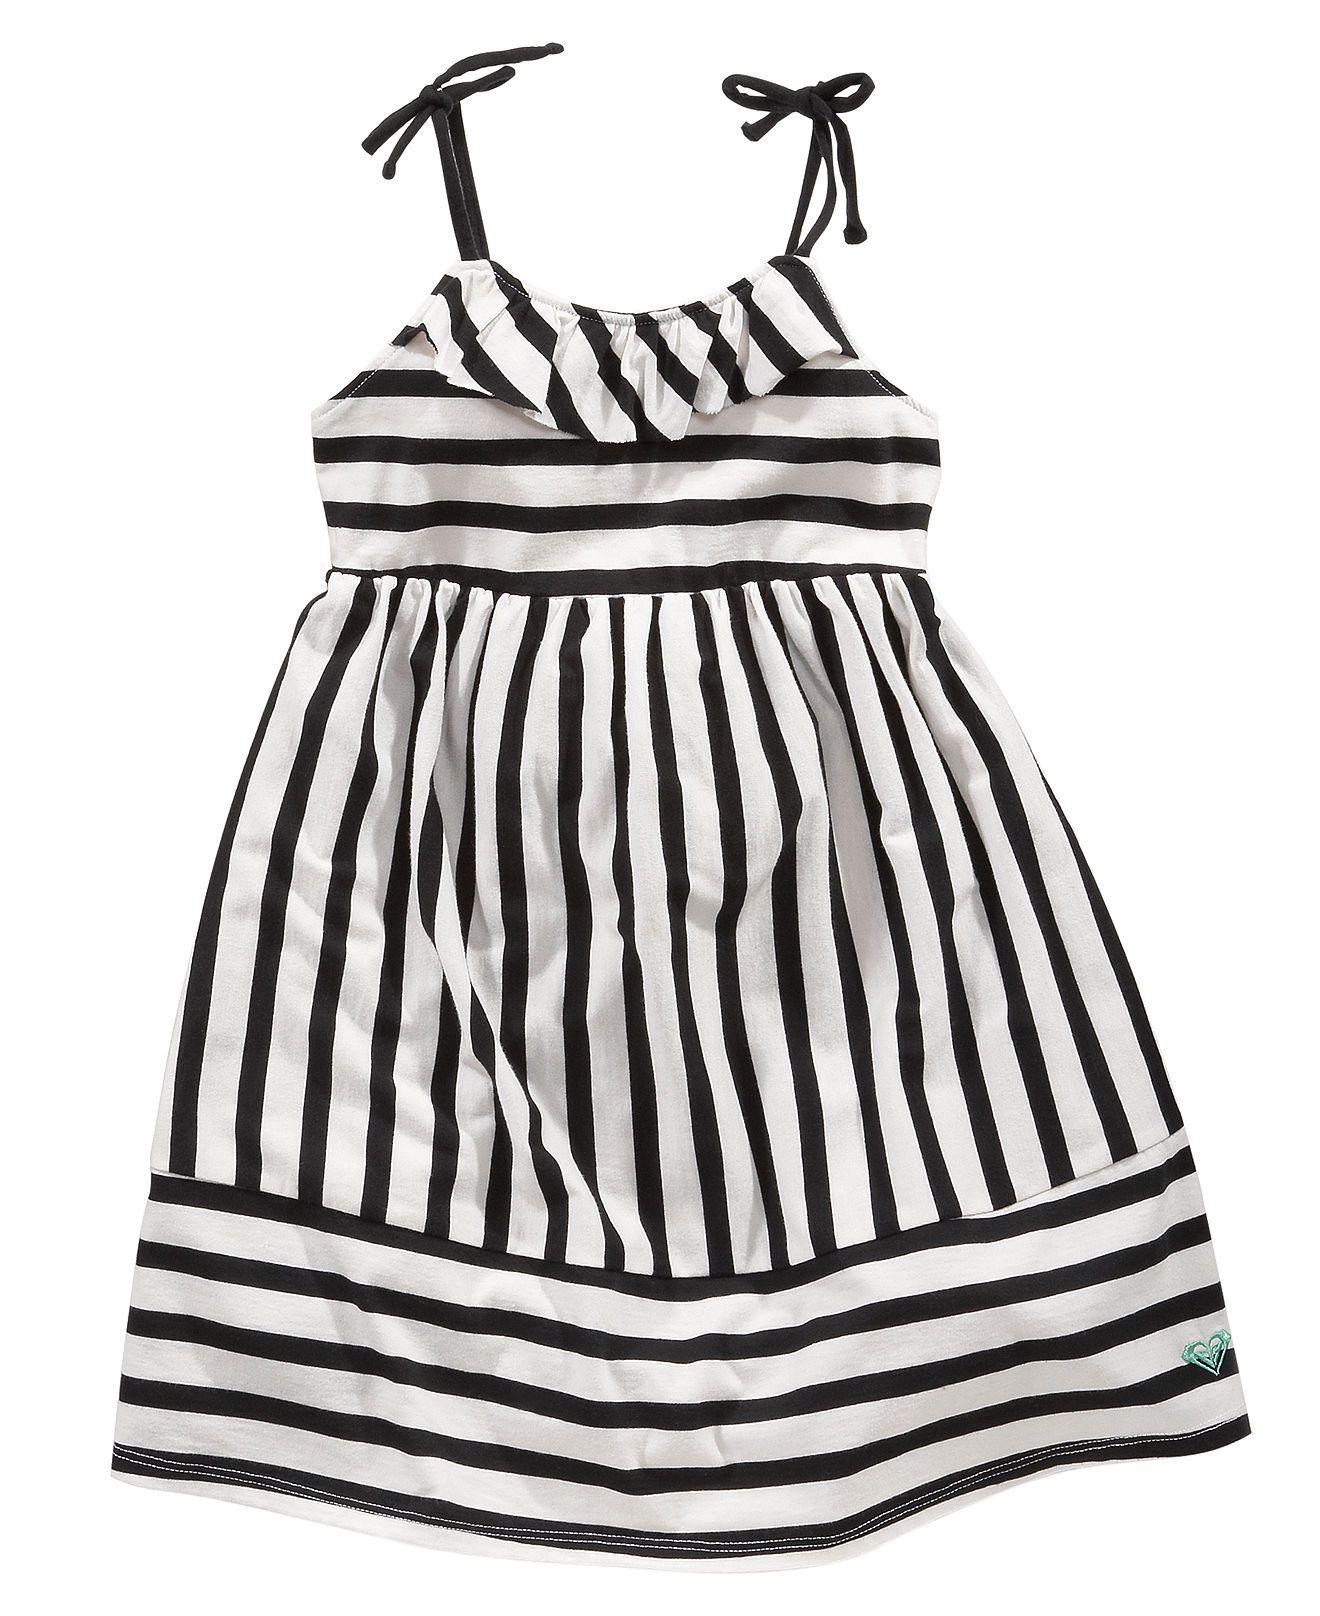 Roxy Kids Dress Little Girls Striped Dress with Itsy Bitsy Spider